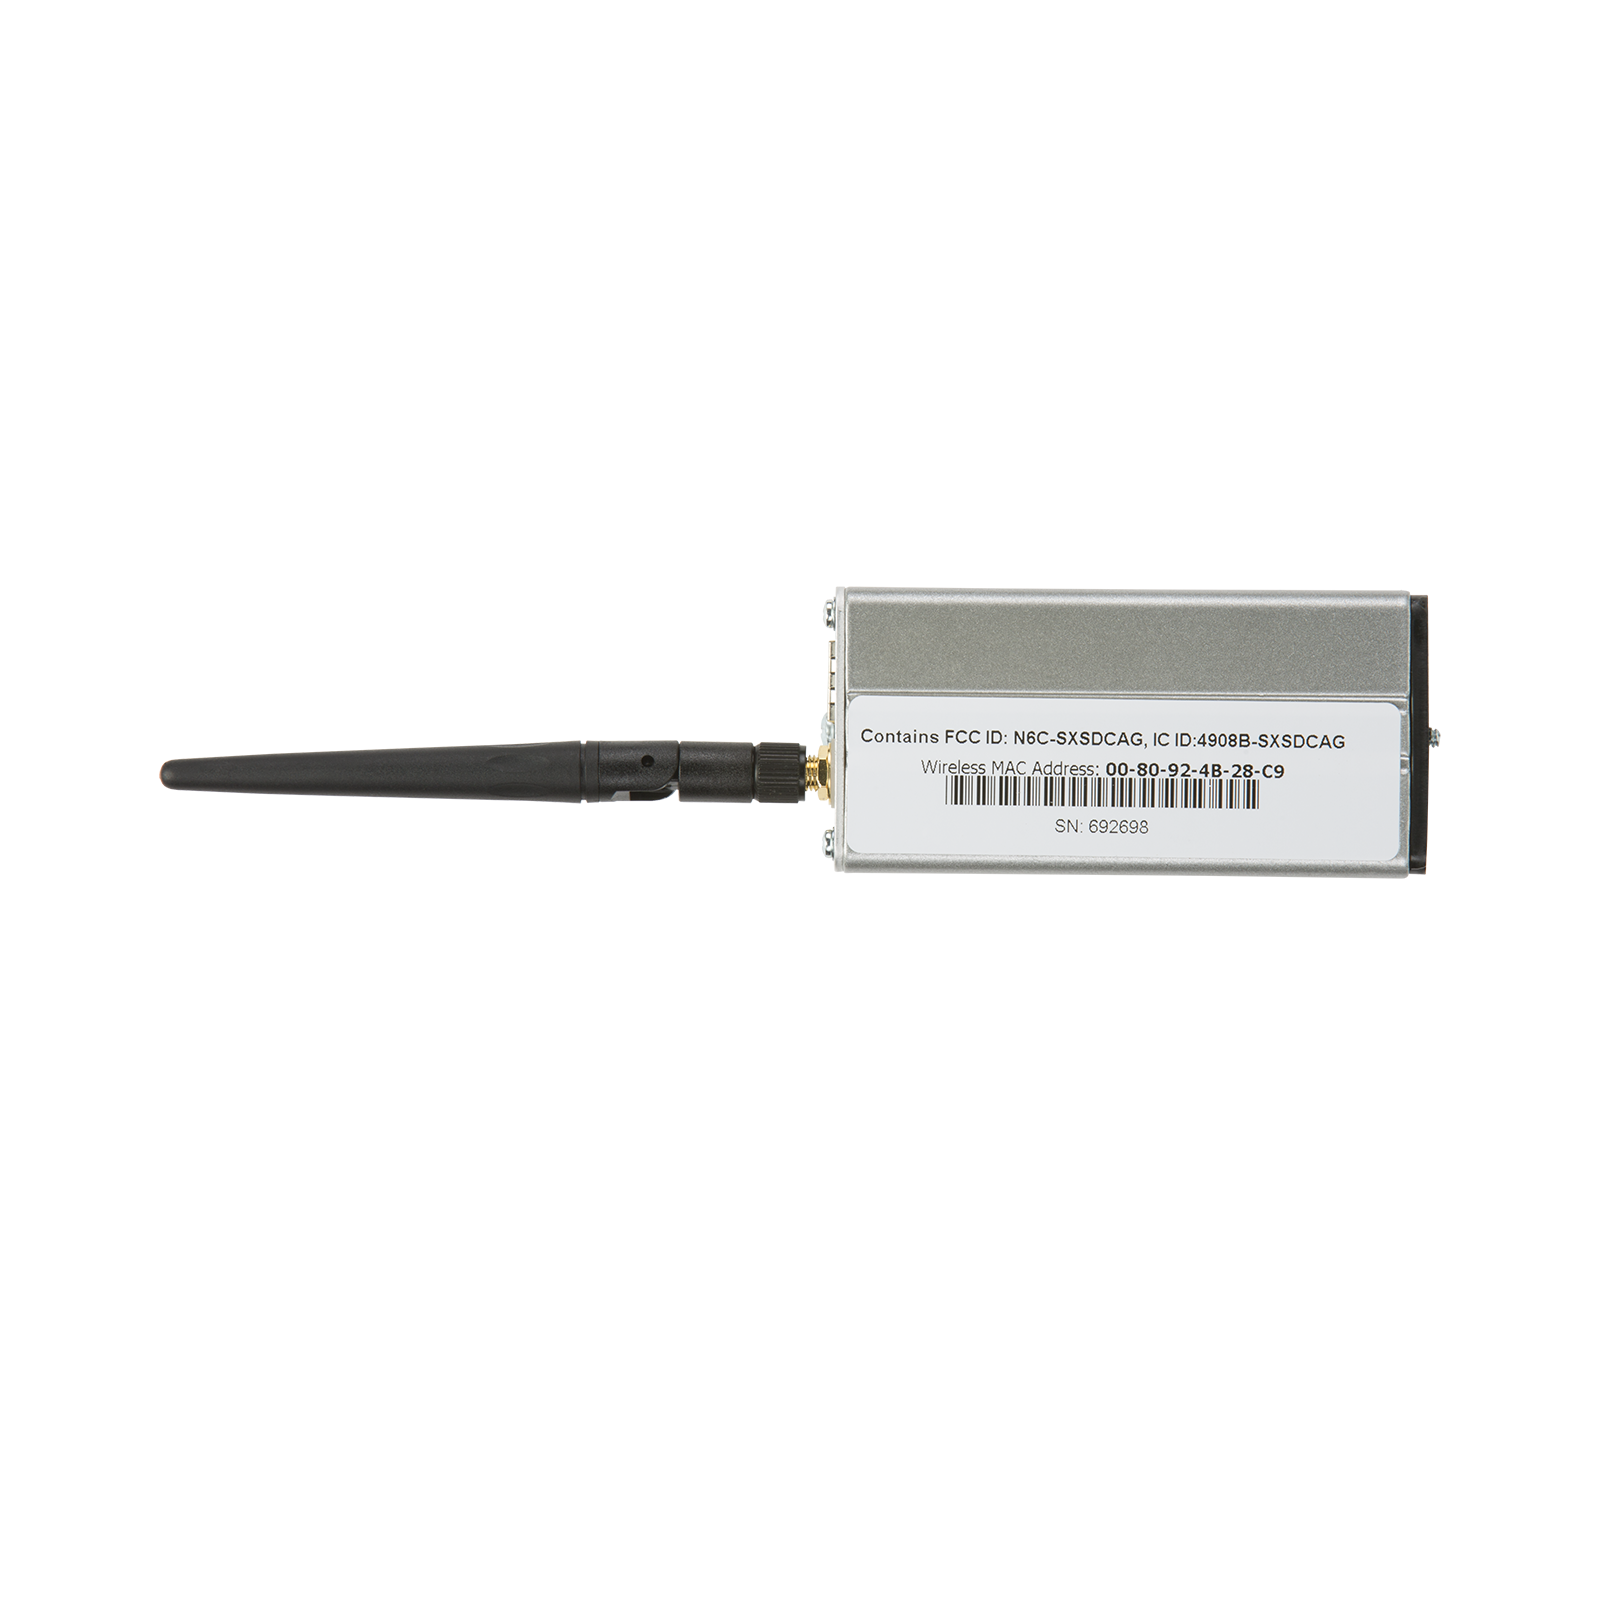 Opto22 Snap Pac Eb1 W Obsolete Wired Wireless Ethernet Opto 22 Wiring Diagram Previous